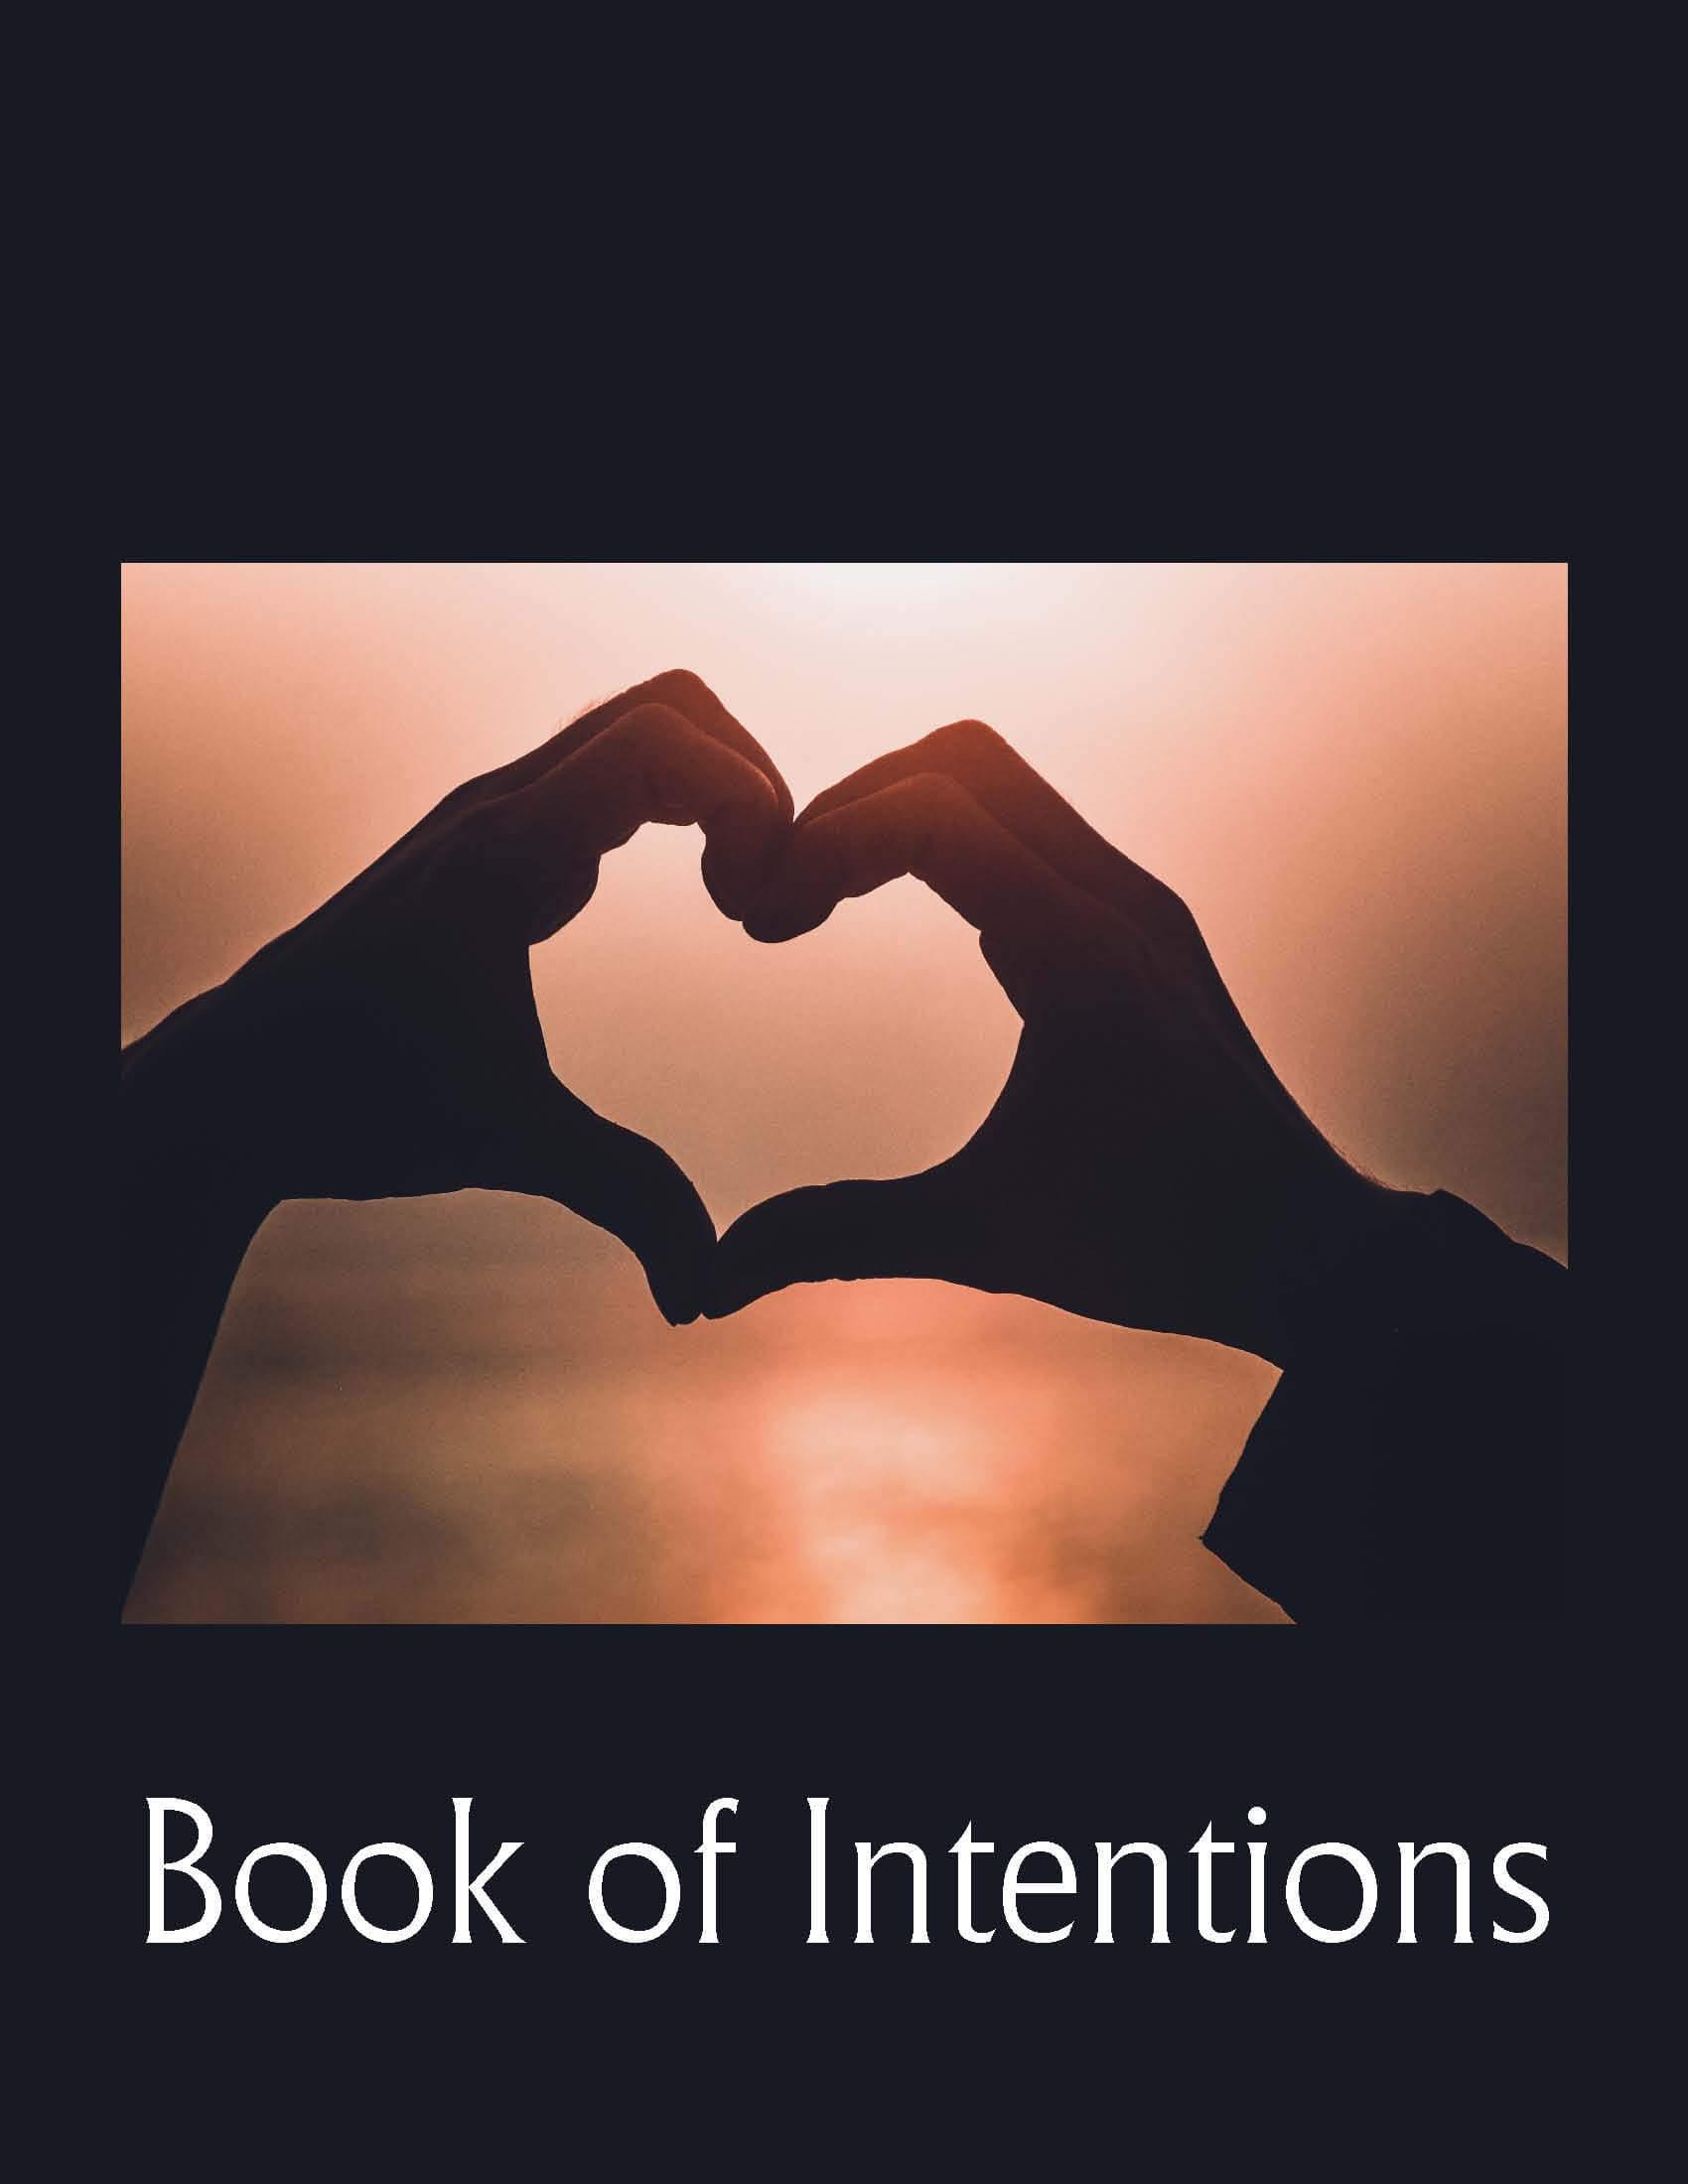 Book of Intentions - Saiph Muhammad Pdf